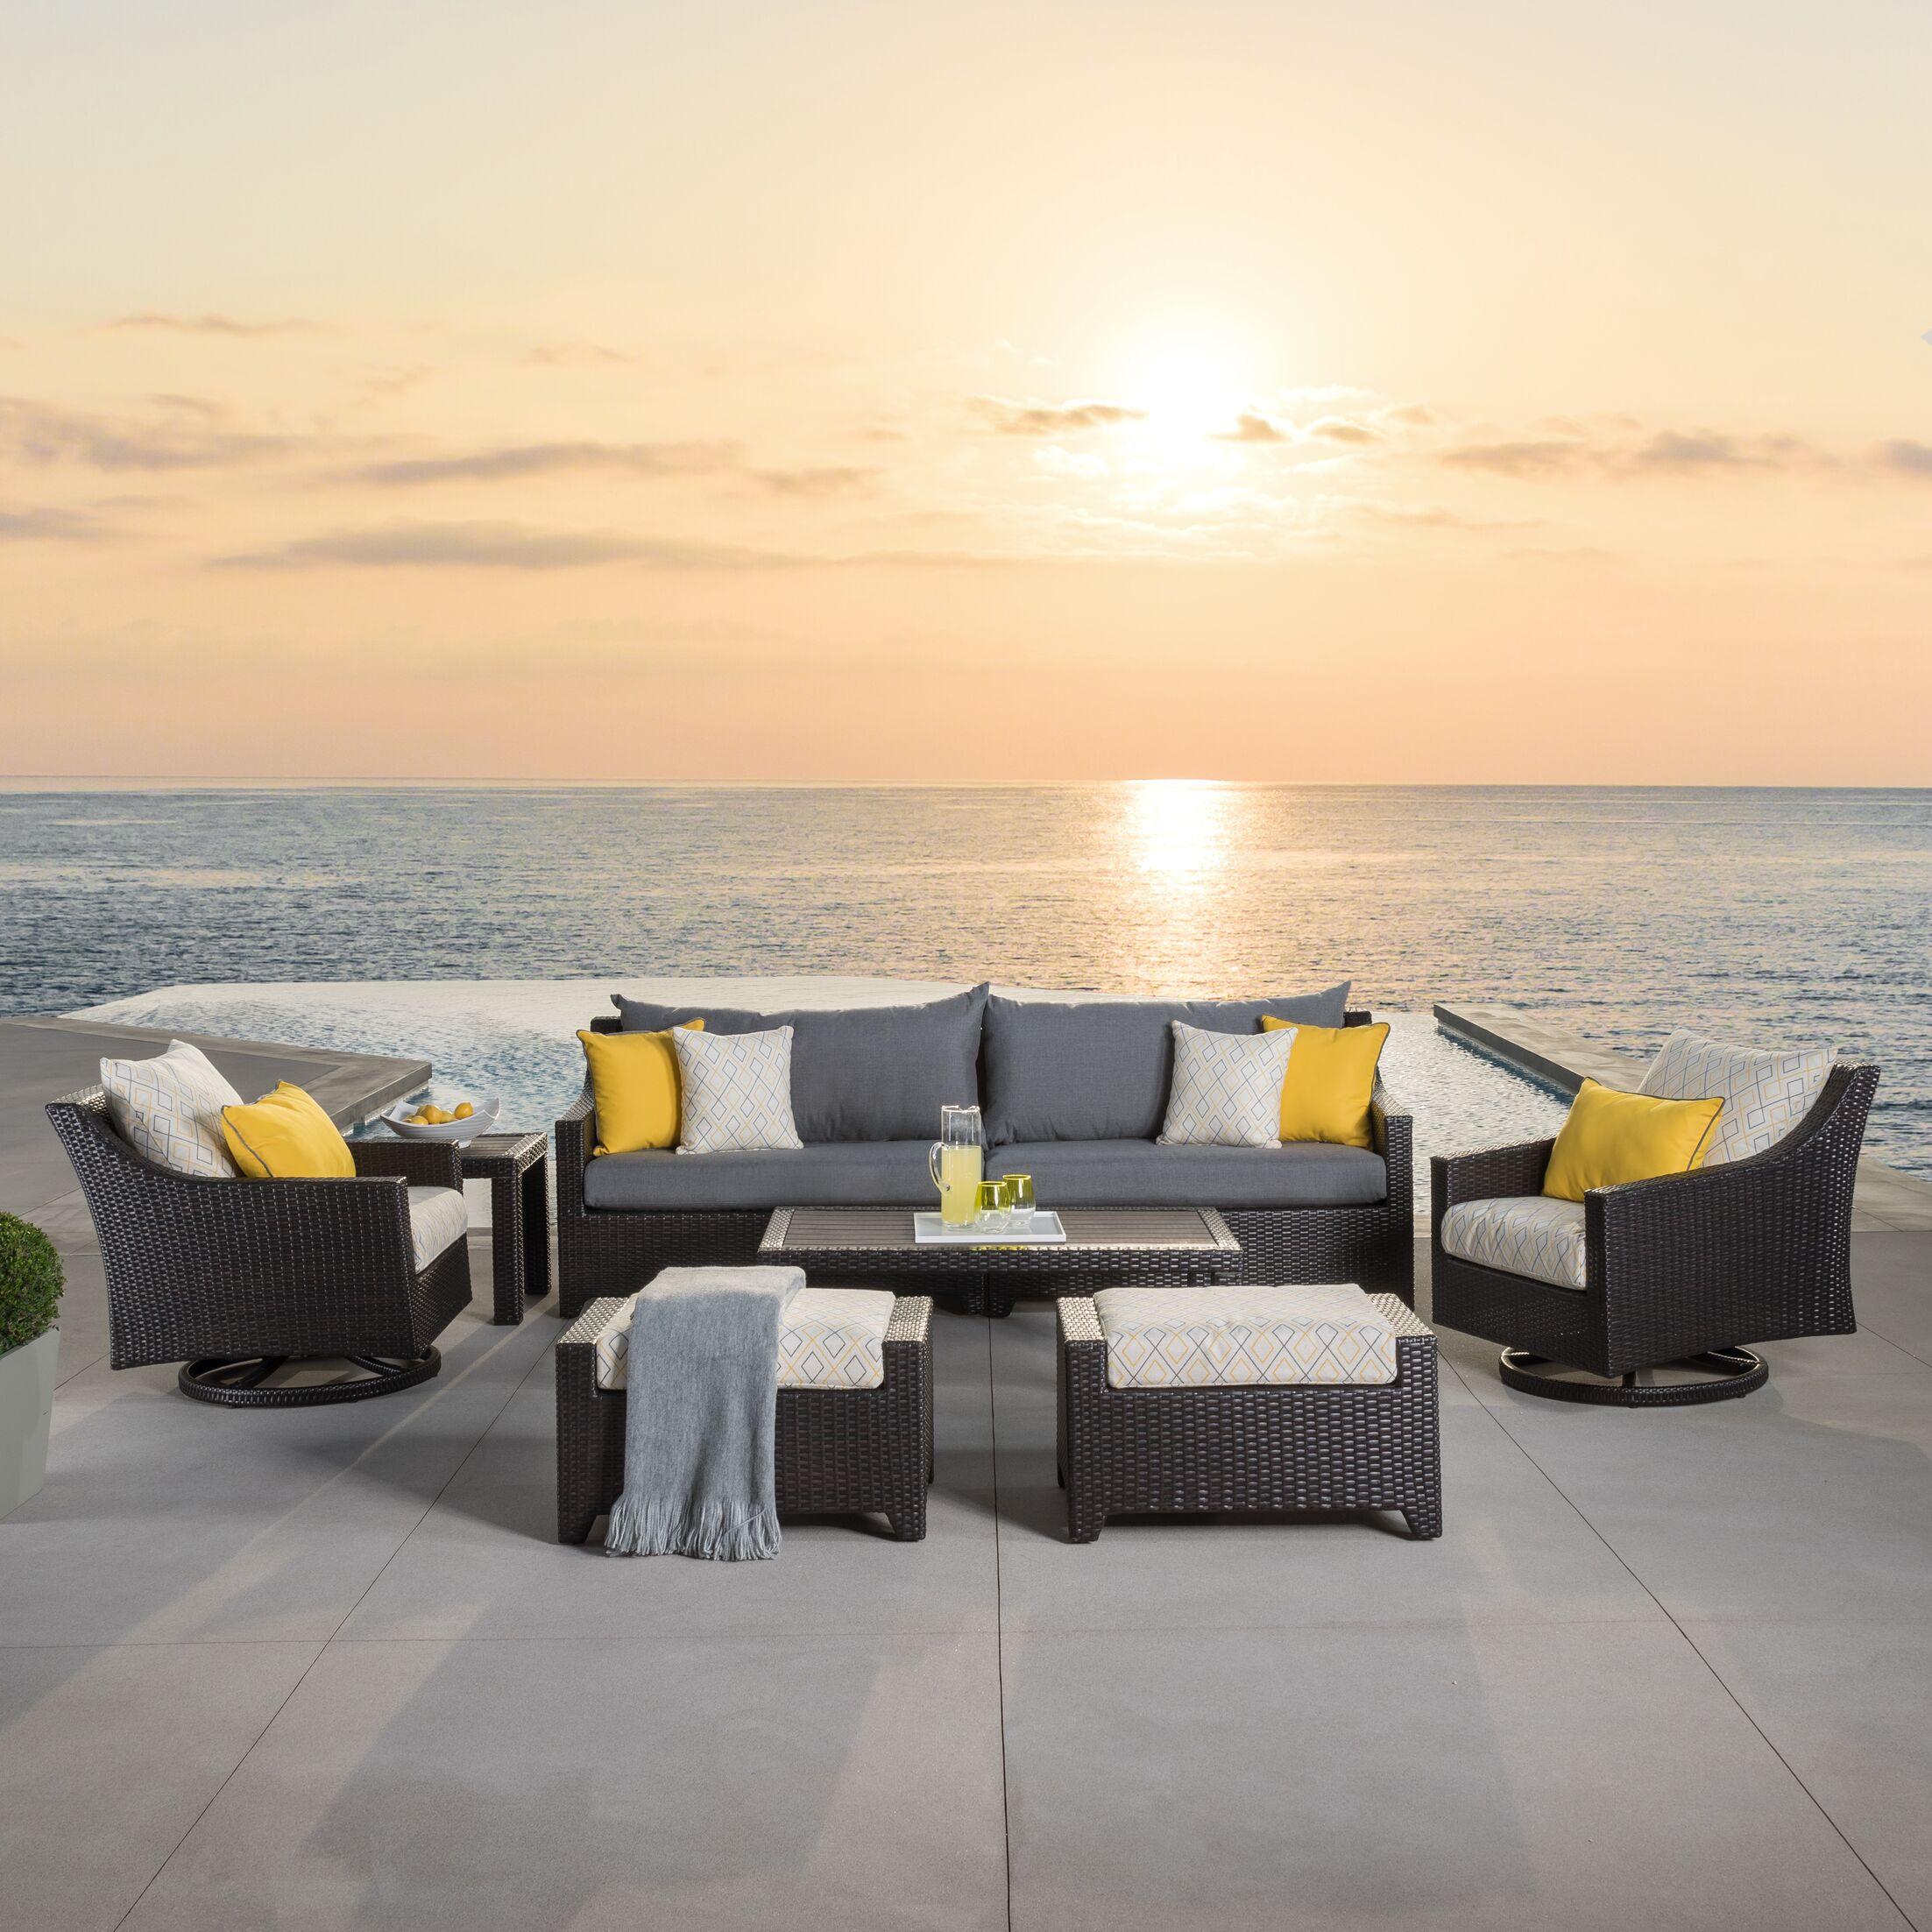 Northridge 8 Piece Sofa Set with Cushions Fabric: Yellow Deluxe